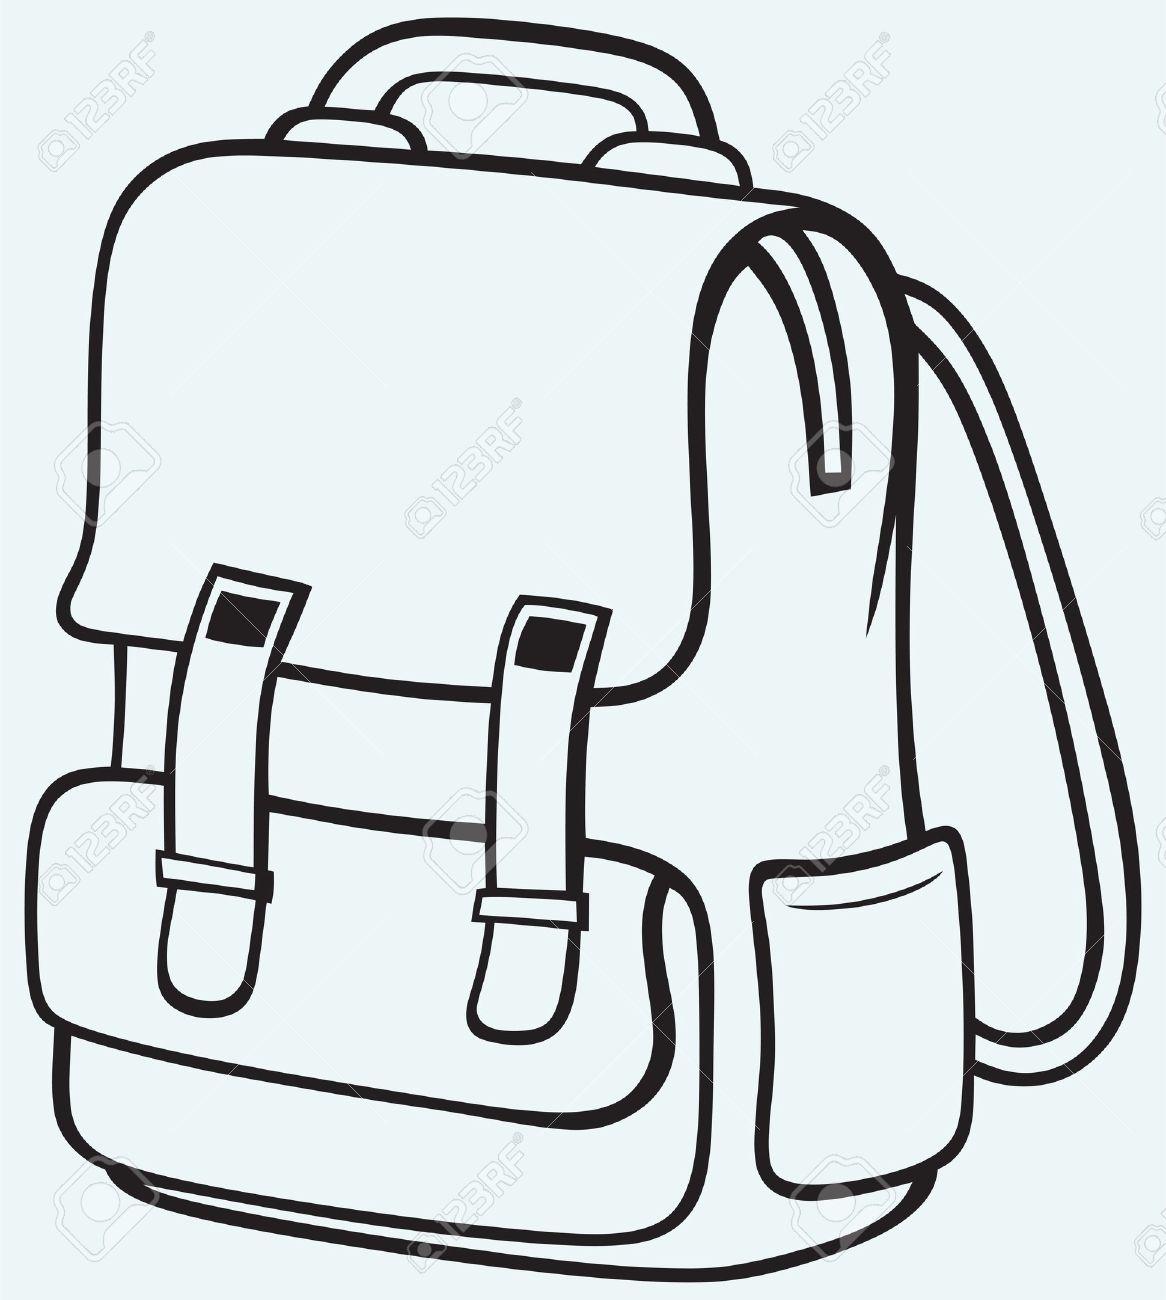 Schoolbsag clipart svg freeuse School Bag Clipart - Free Clipart svg freeuse